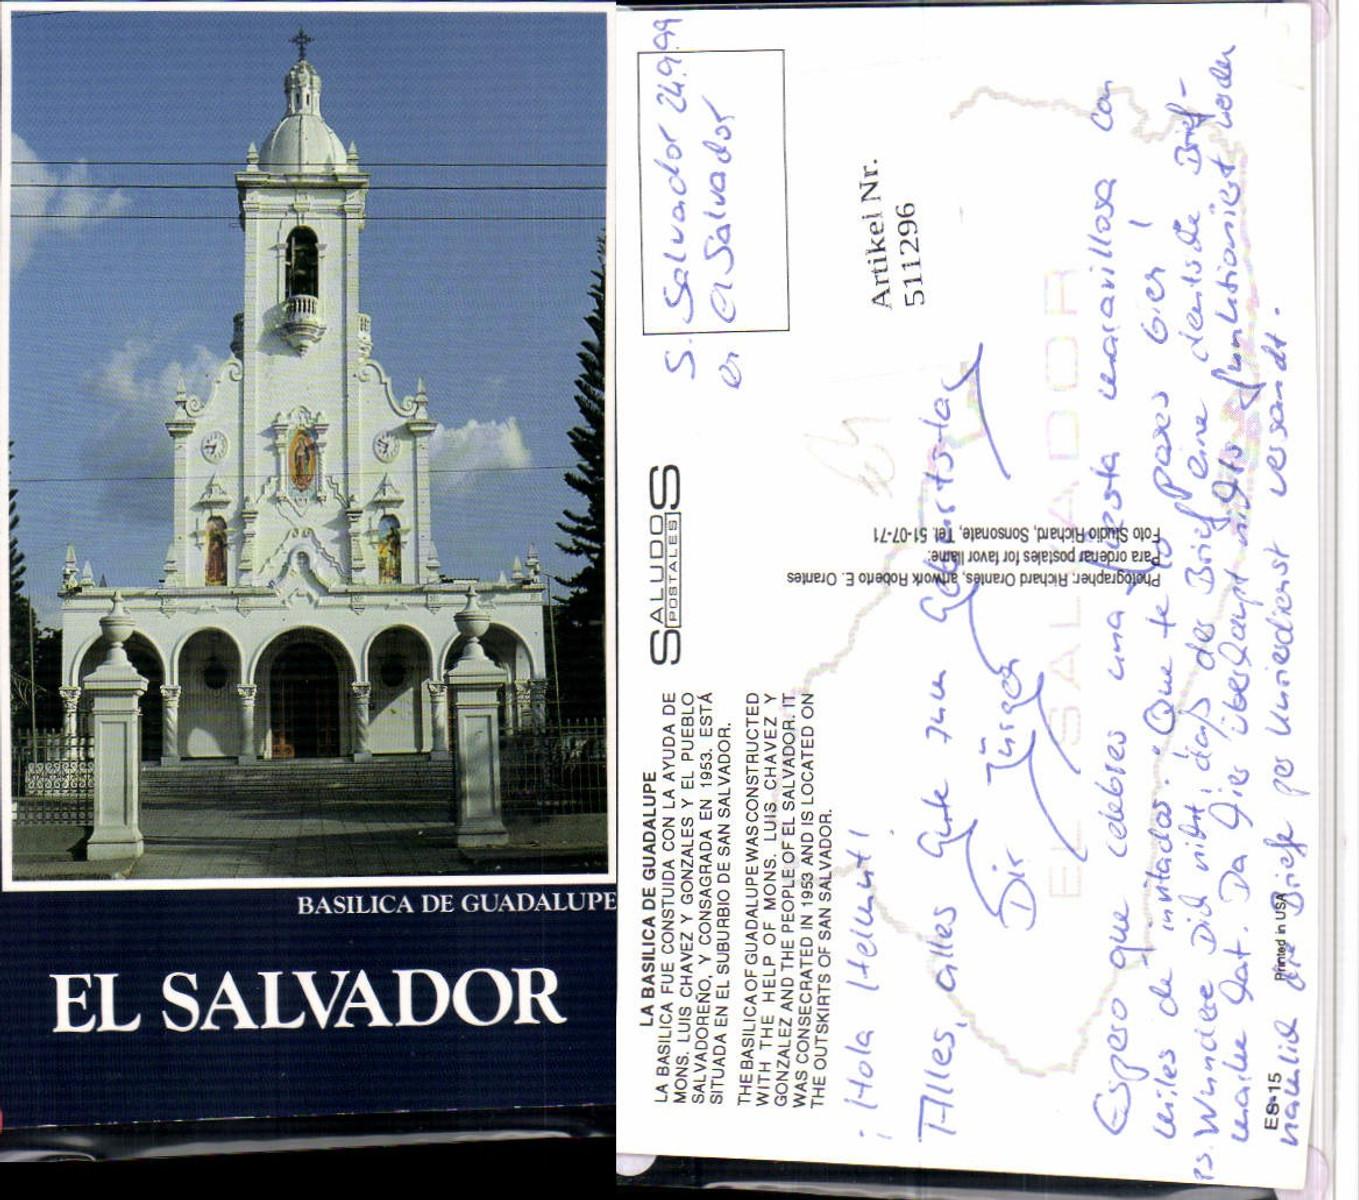 511296,El Salvador Basilica de Guadalupe Kirche günstig online kaufen